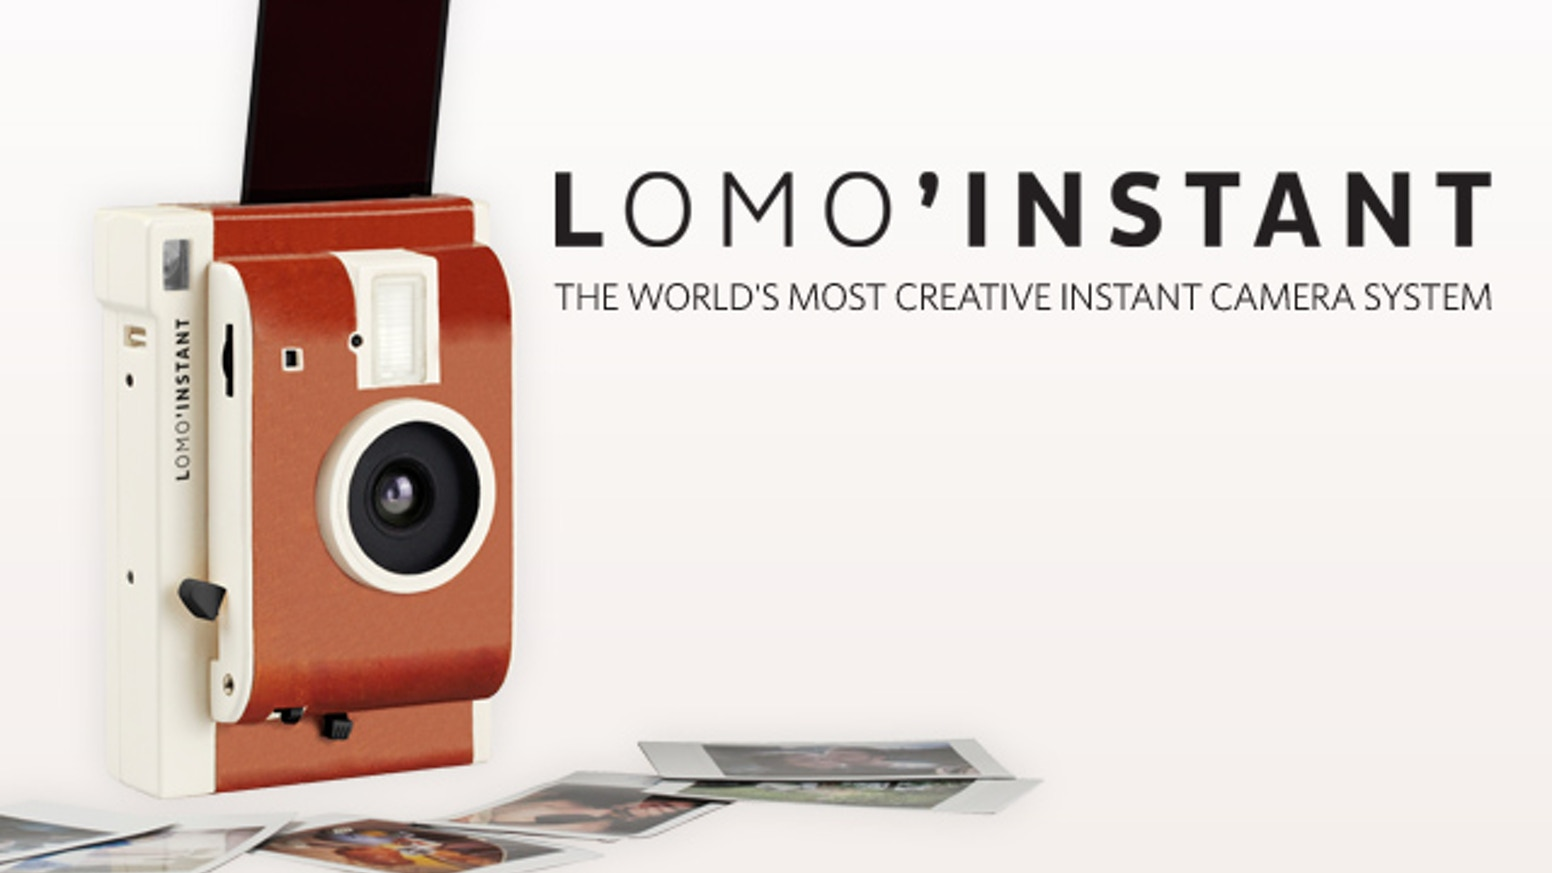 The Lomoinstant Camera By Lomography Kickstarter Instant Sanremo Edition